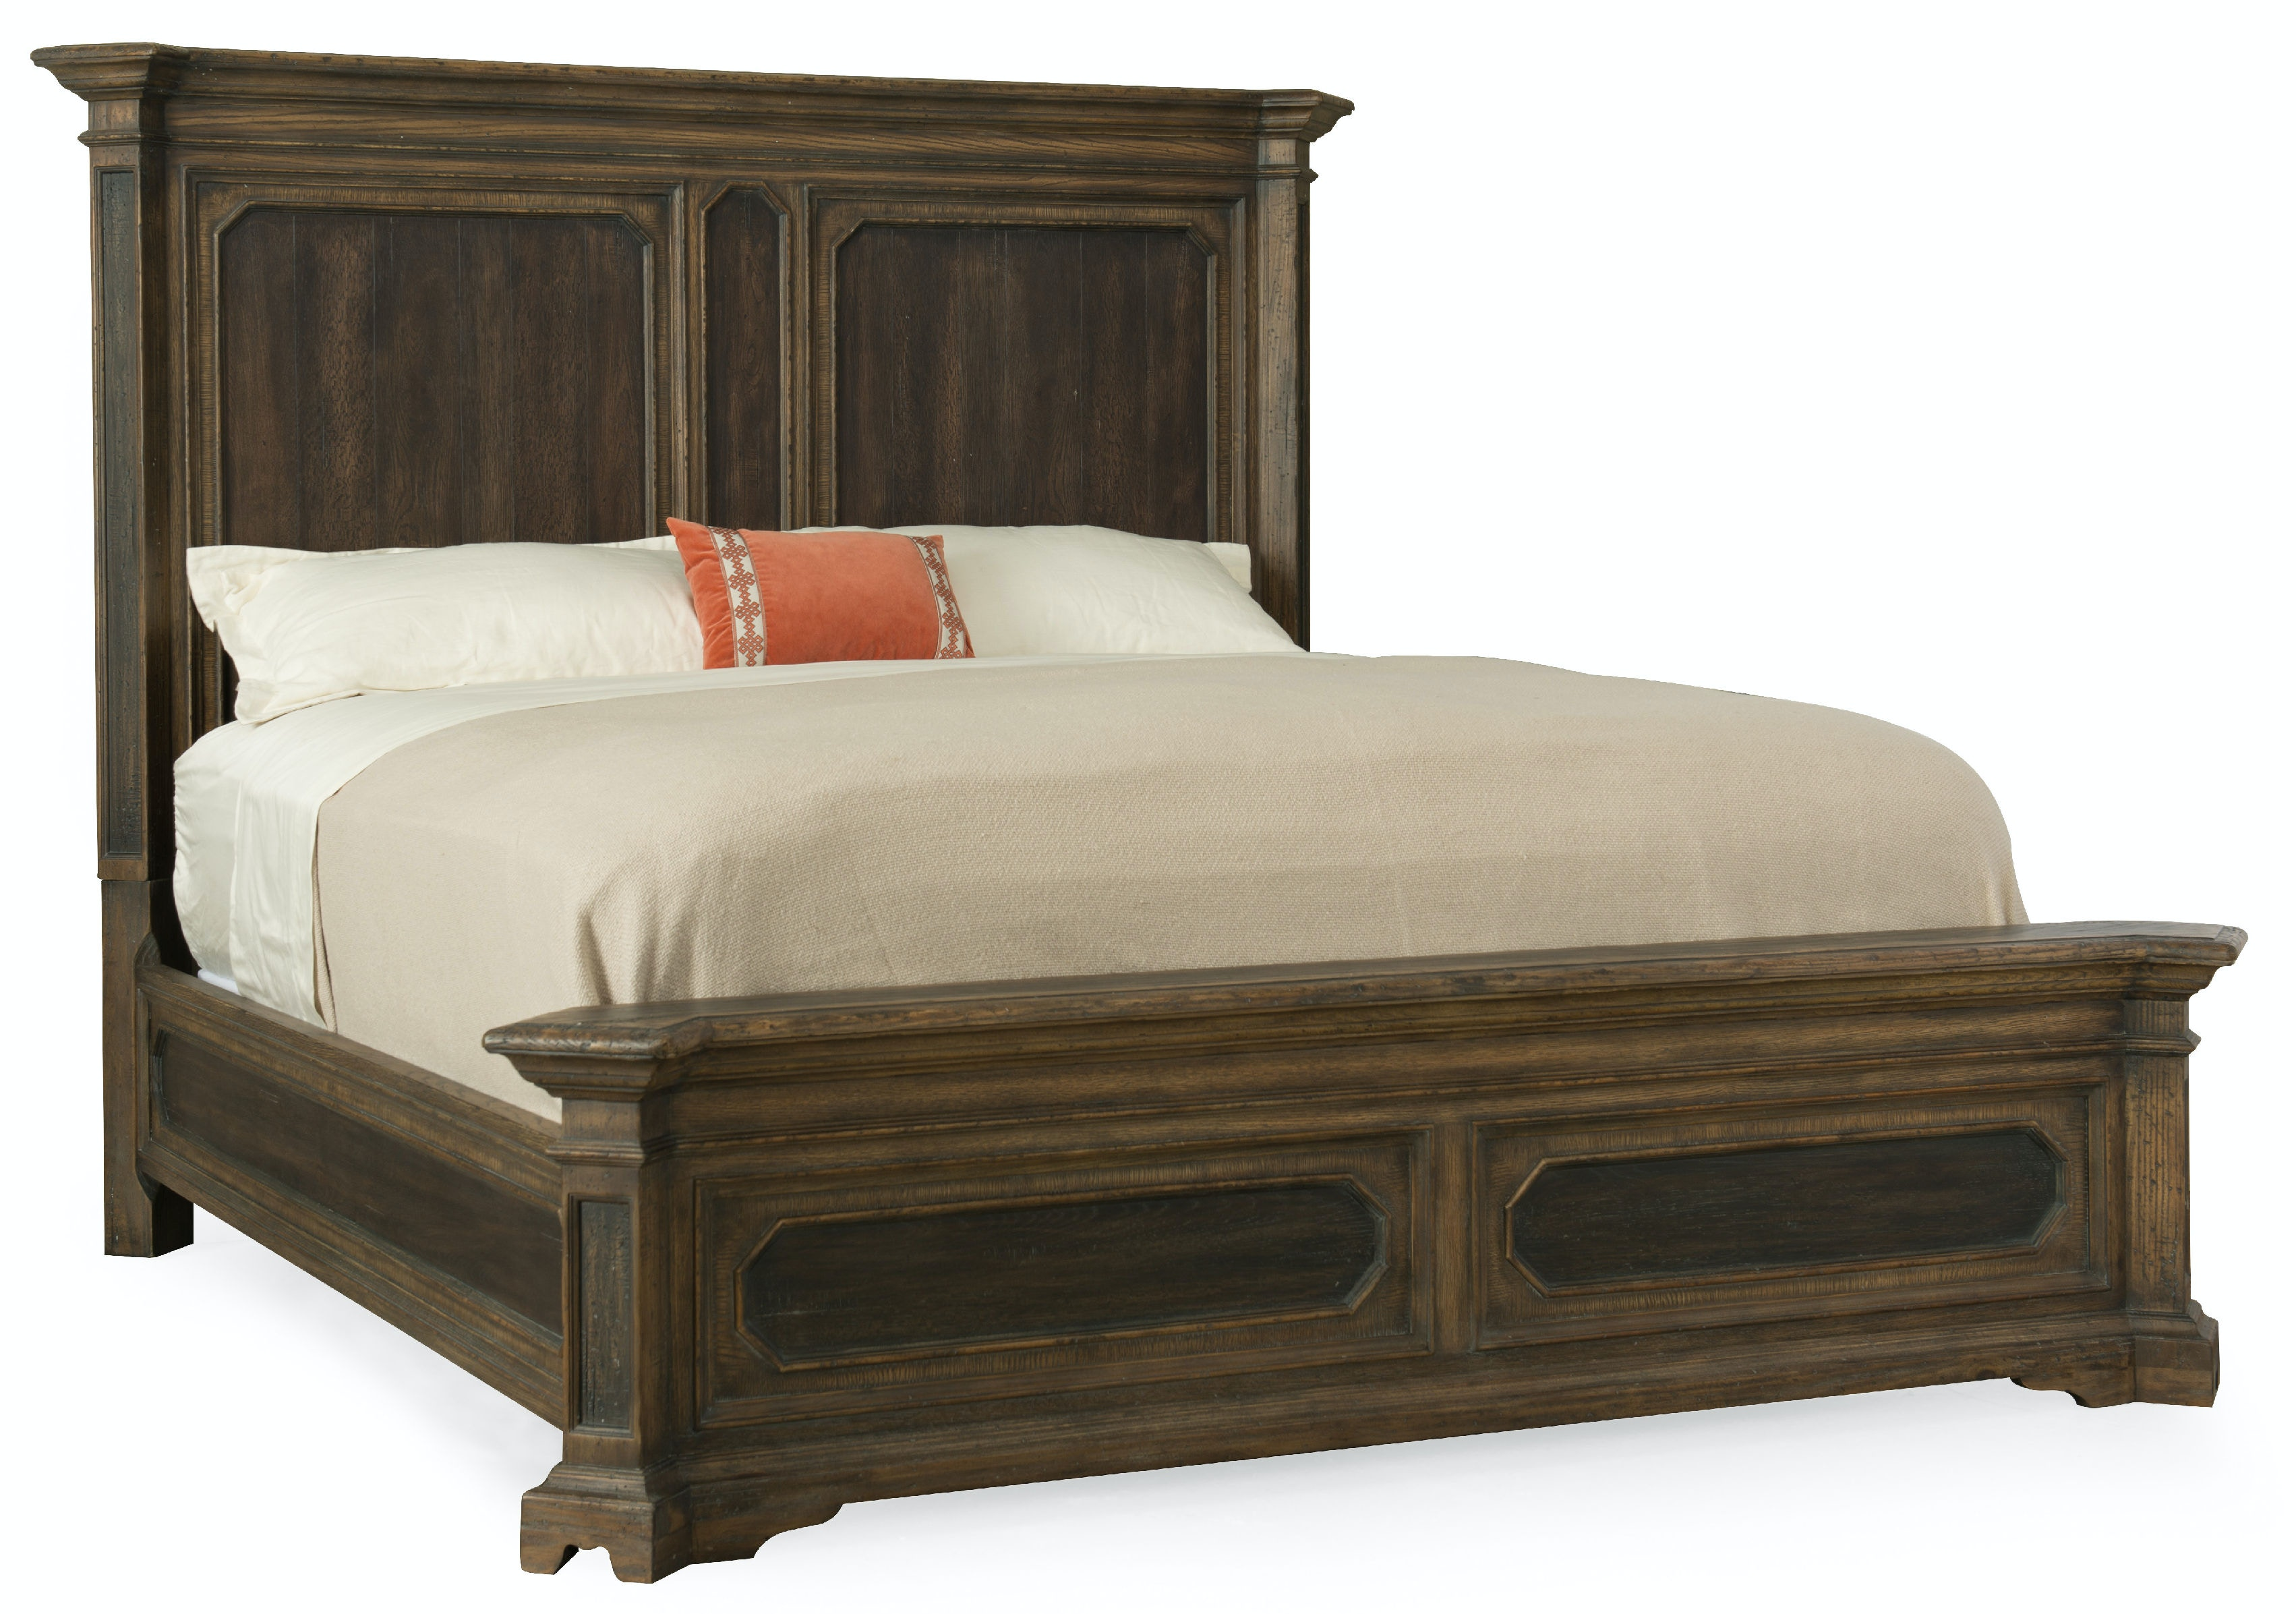 Hooker Furniture Woodcreek King Mansion Bed 5960 90266 MULTI